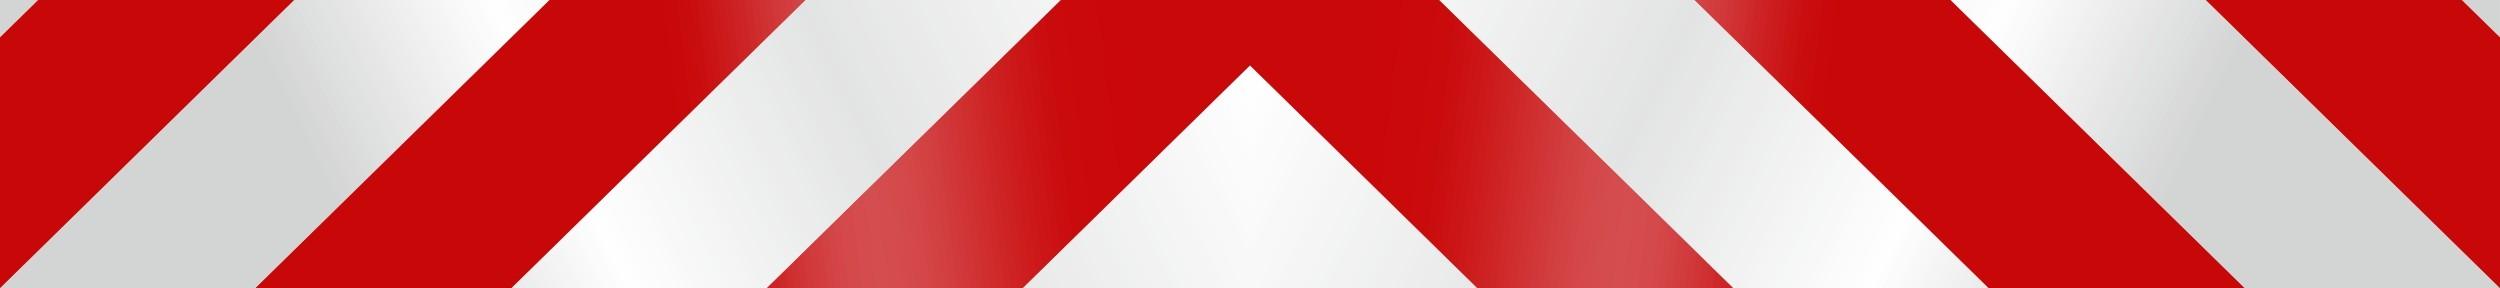 Sticker reflecting-glow-line pole-stripe white/red – Bild 1